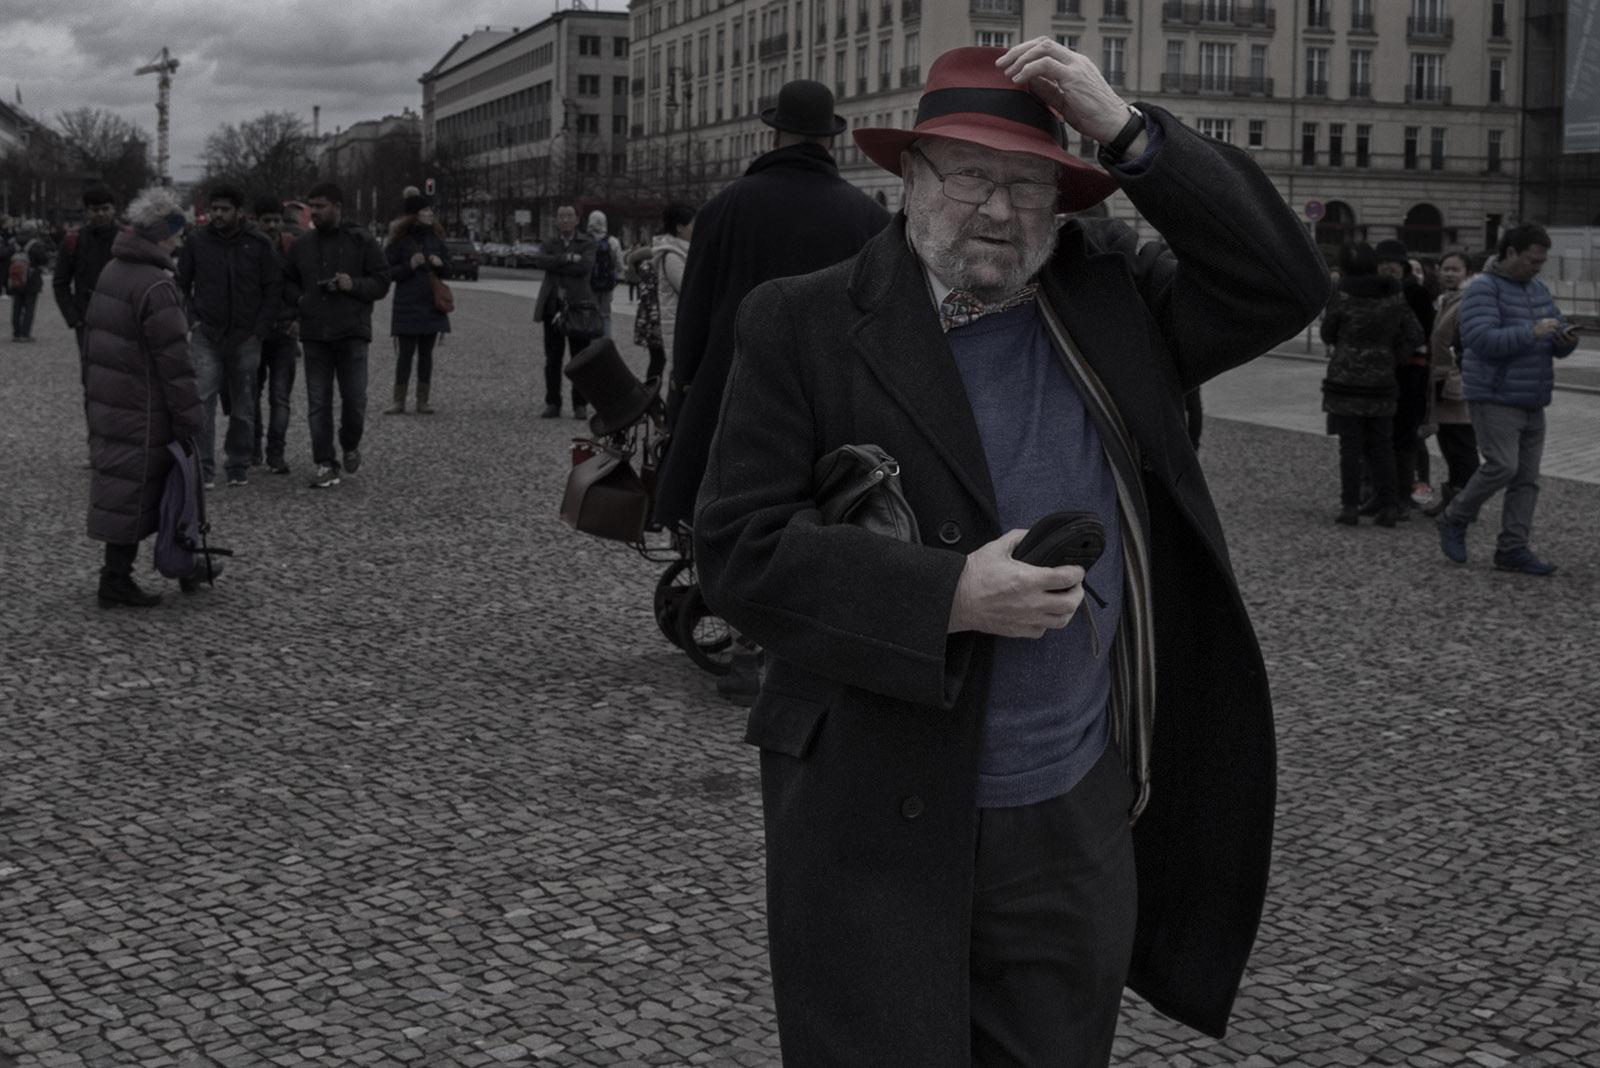 berlino_street_018.jpg